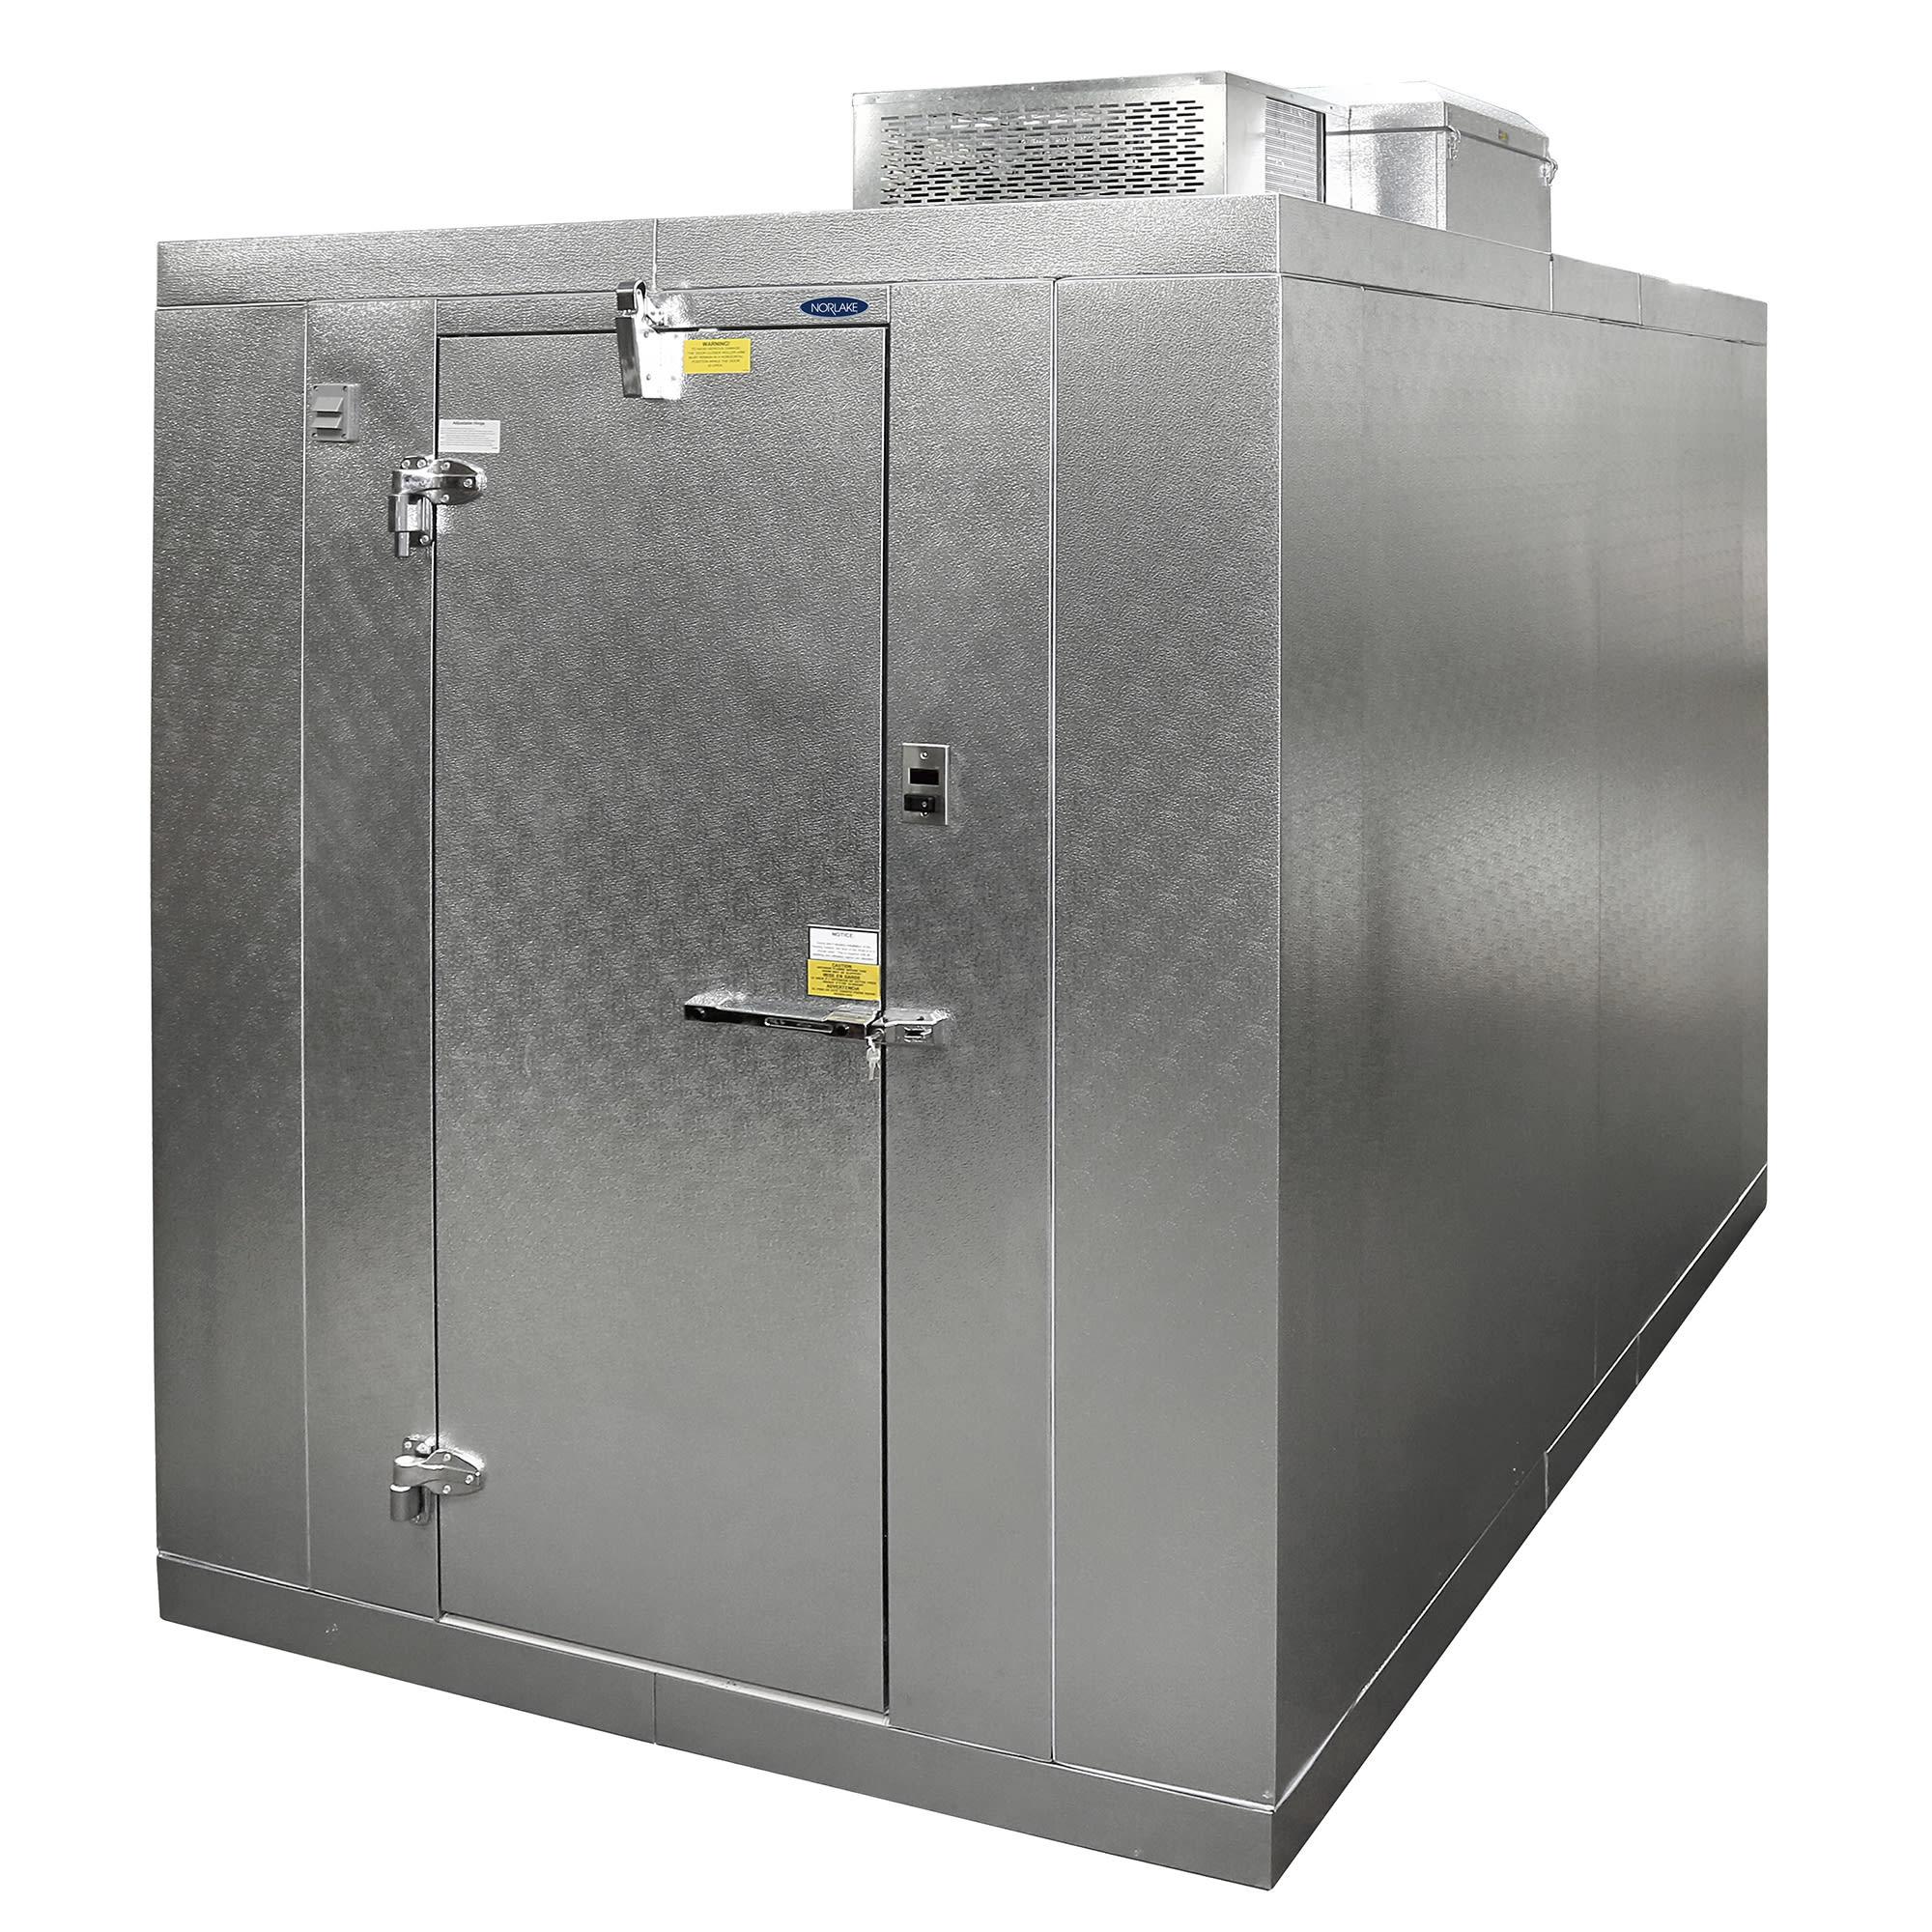 Nor-Lake KLB7466-C R Indoor Walk-In Refrigerator w/ Top M...